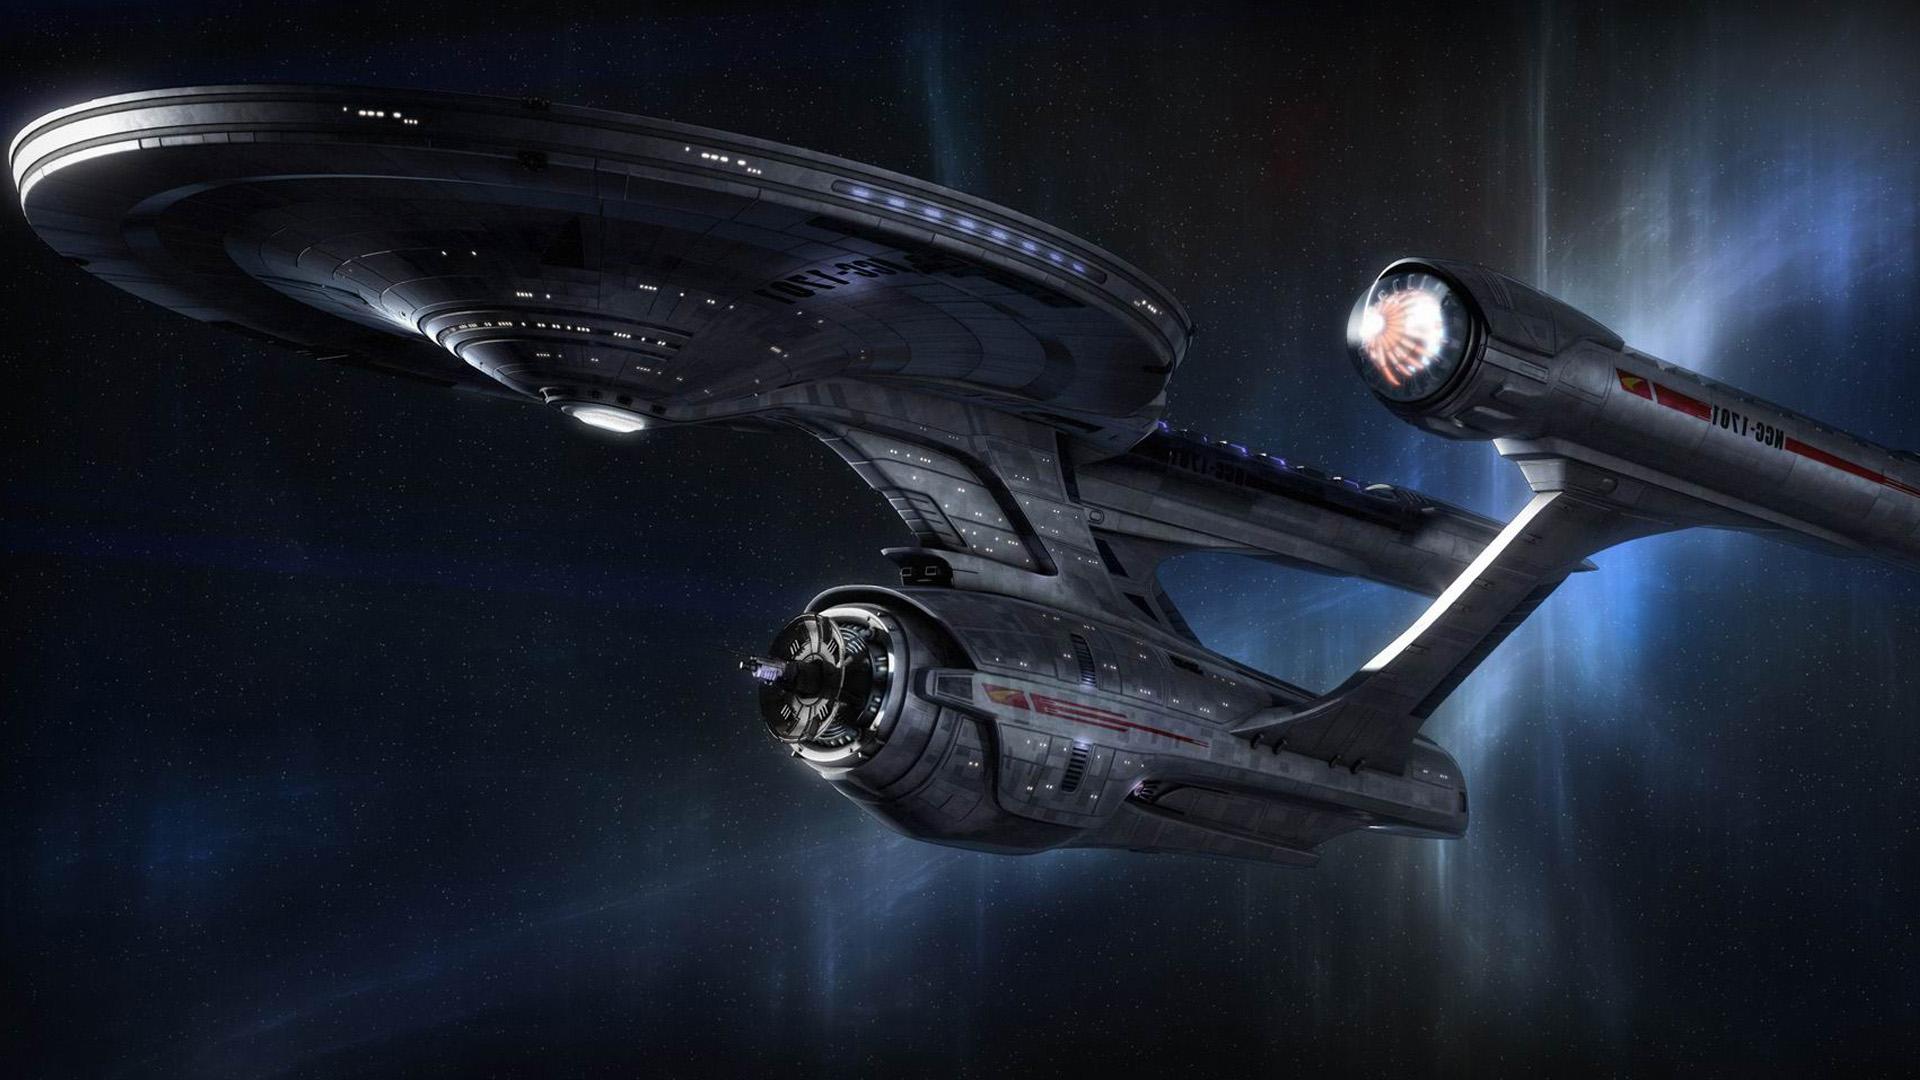 Star Trek Classic NCC 1701 Vehicle HD Wallpapers 1920x1080